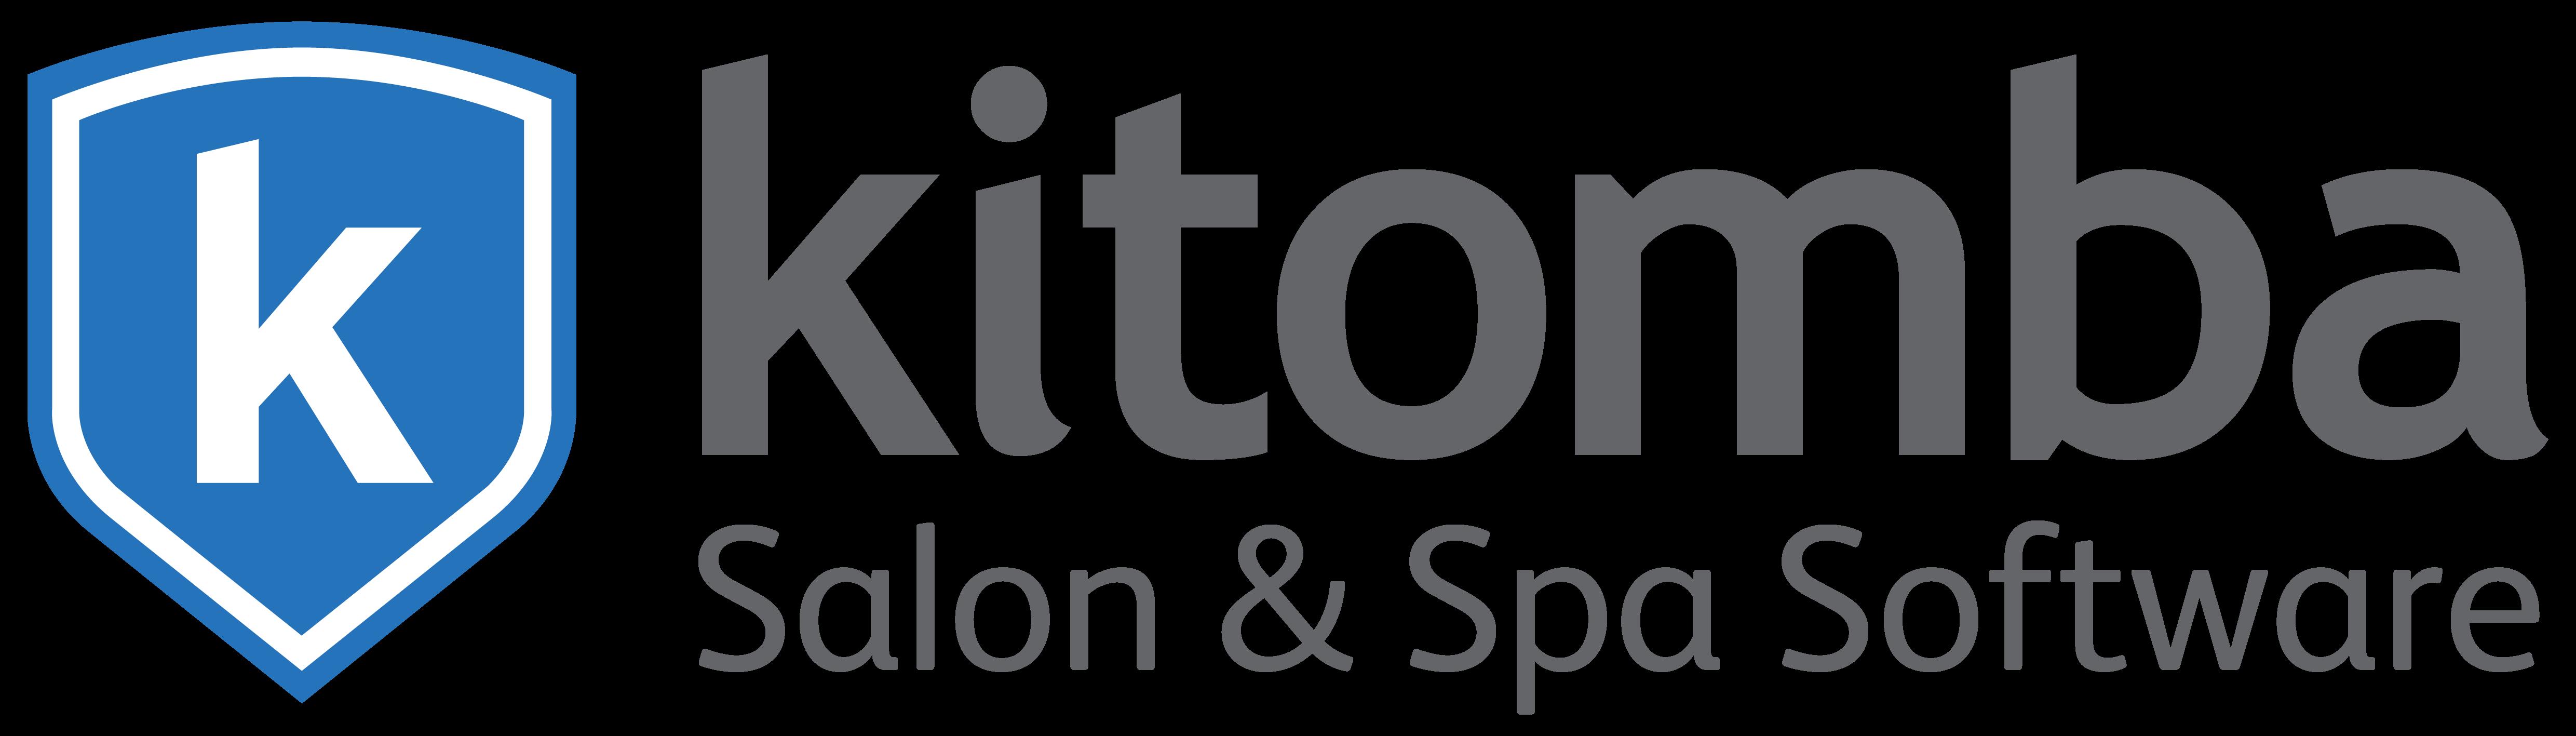 Kitomba Salon and Spa Software